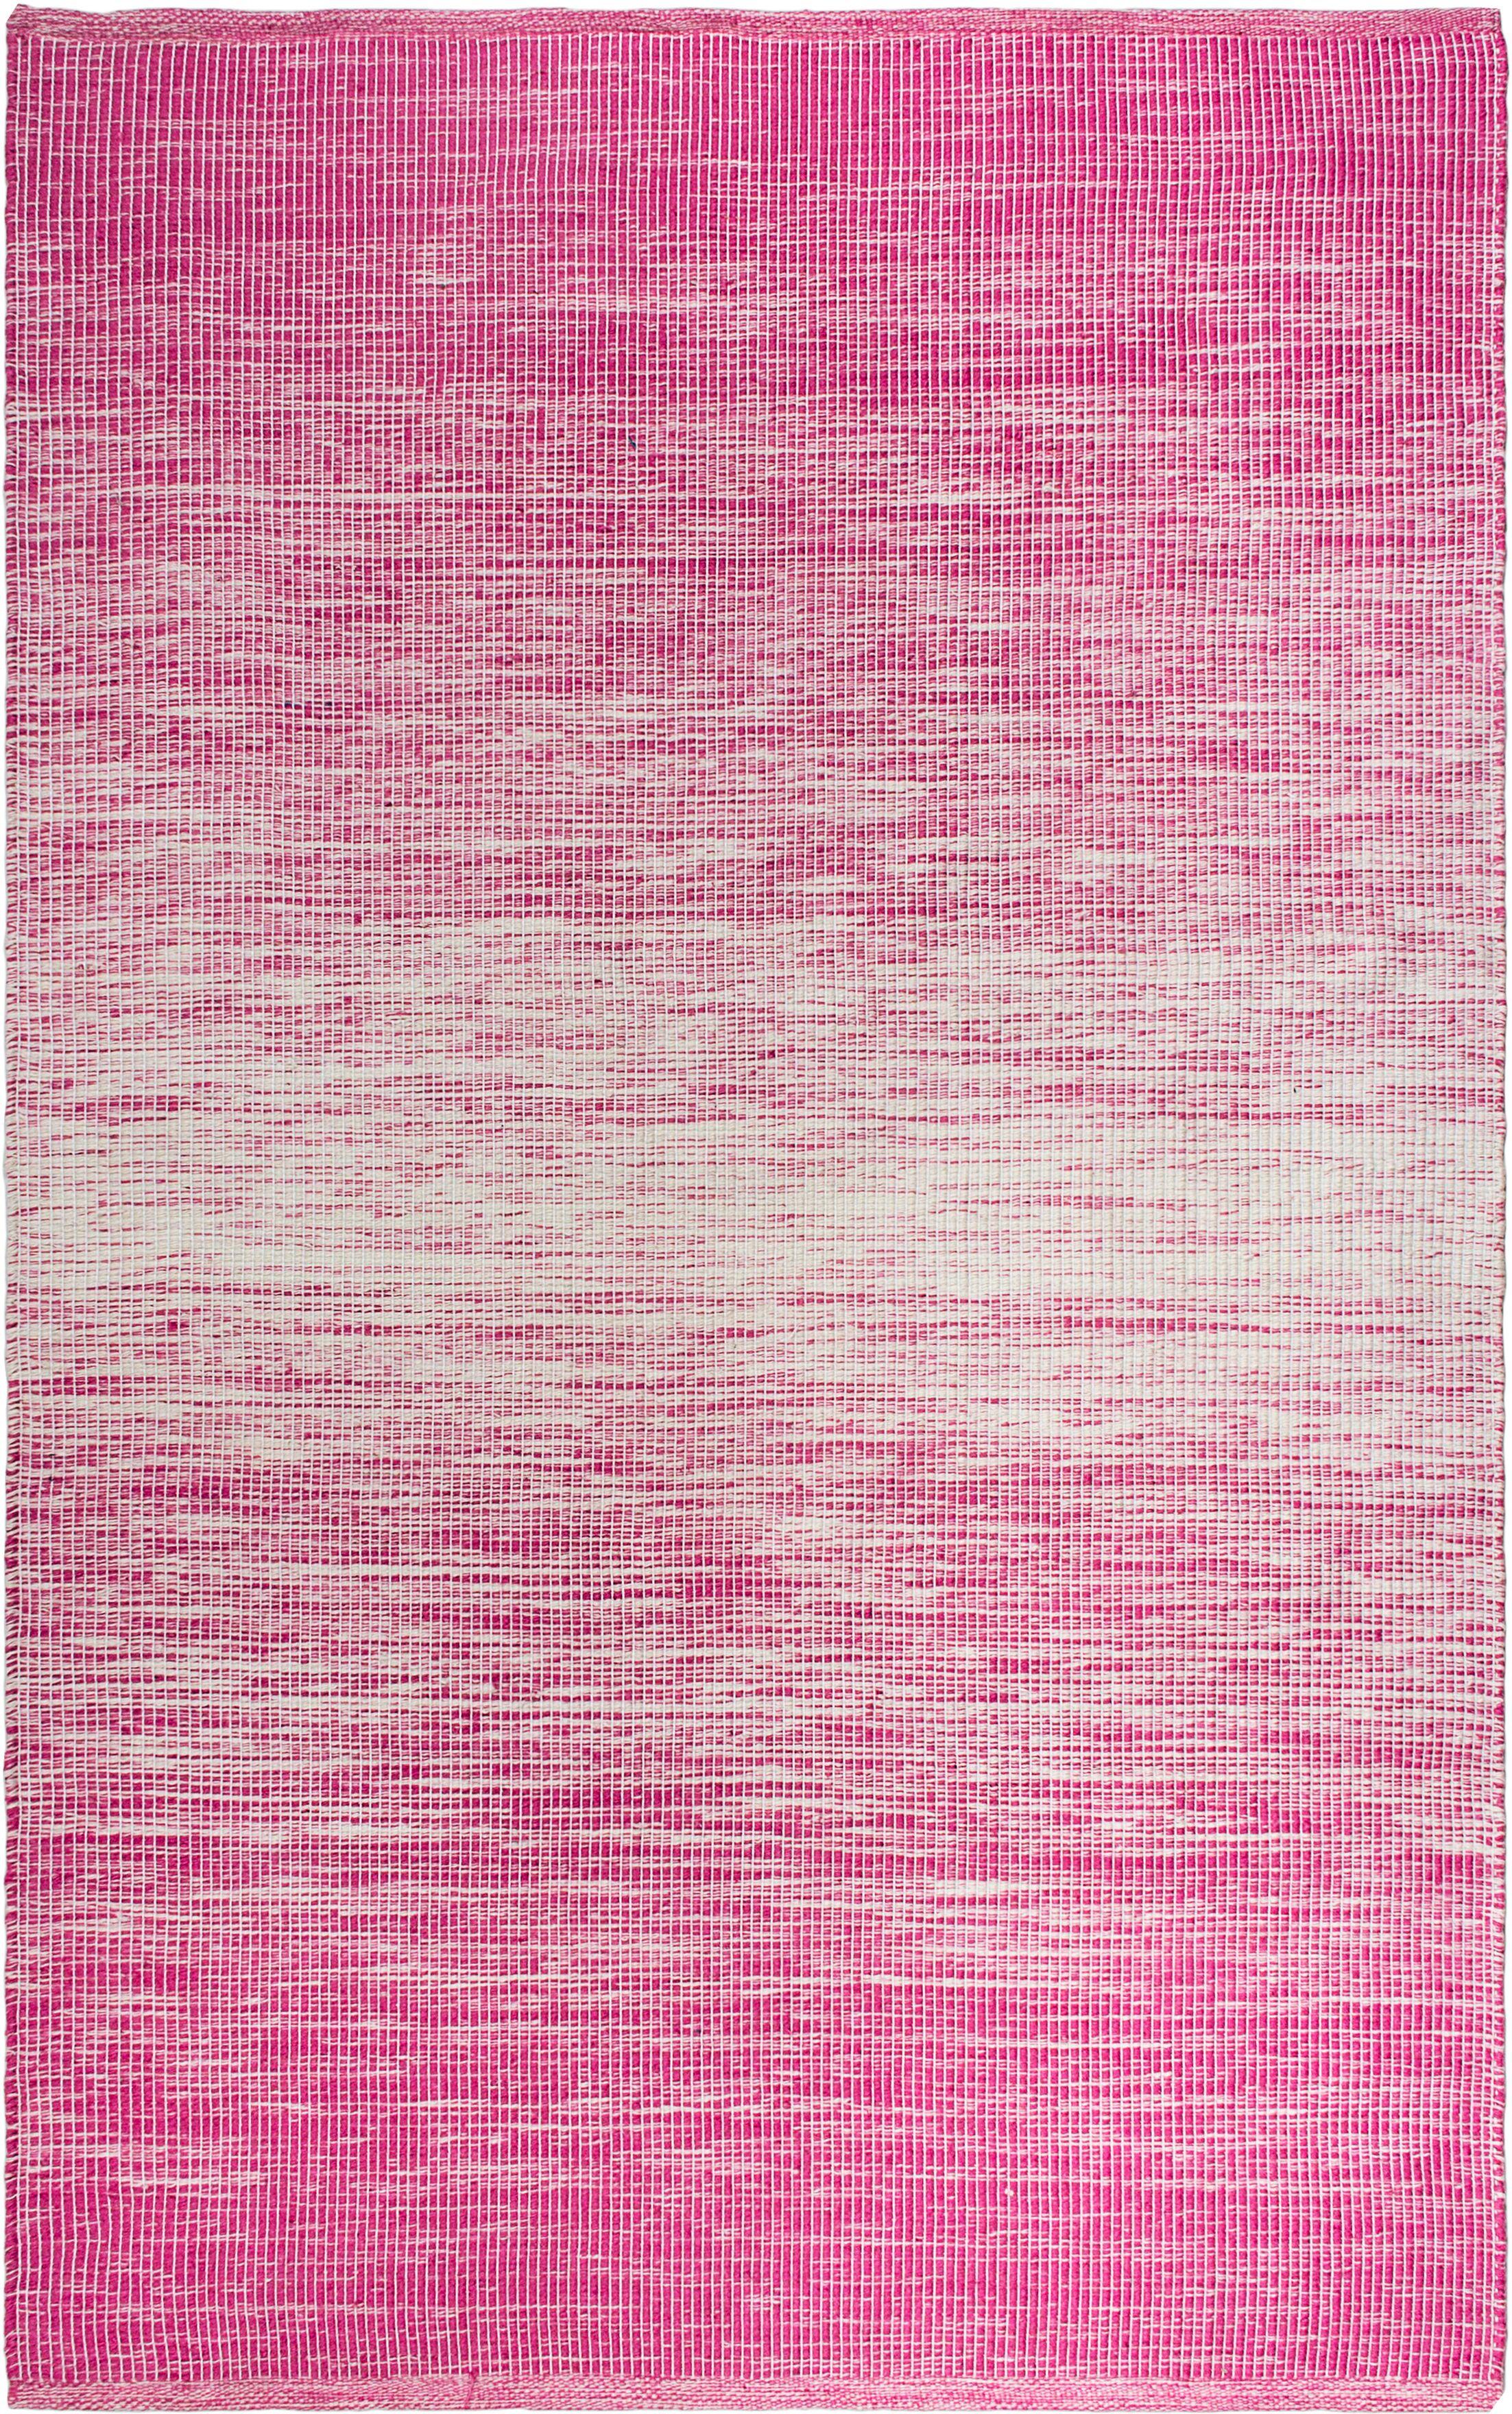 Estate Hand-Woven Pink Indoor/Outdoor Area Rug Rug Size: 5' x 8'